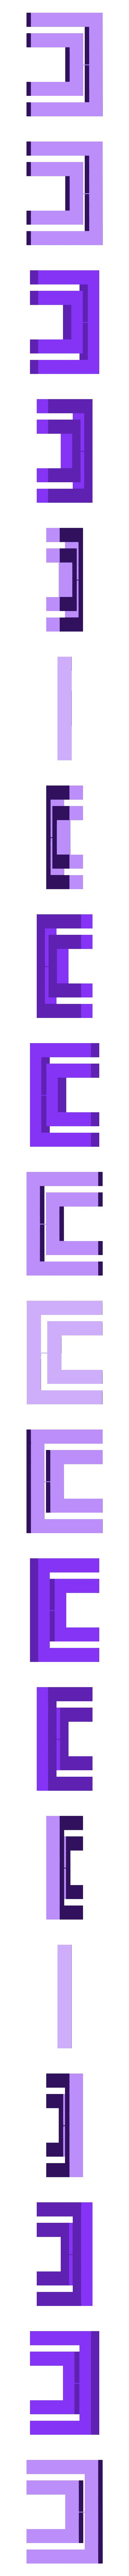 WakandaFont-L.stl Download free STL file Wakandan Font • Model to 3D print, hterefenko